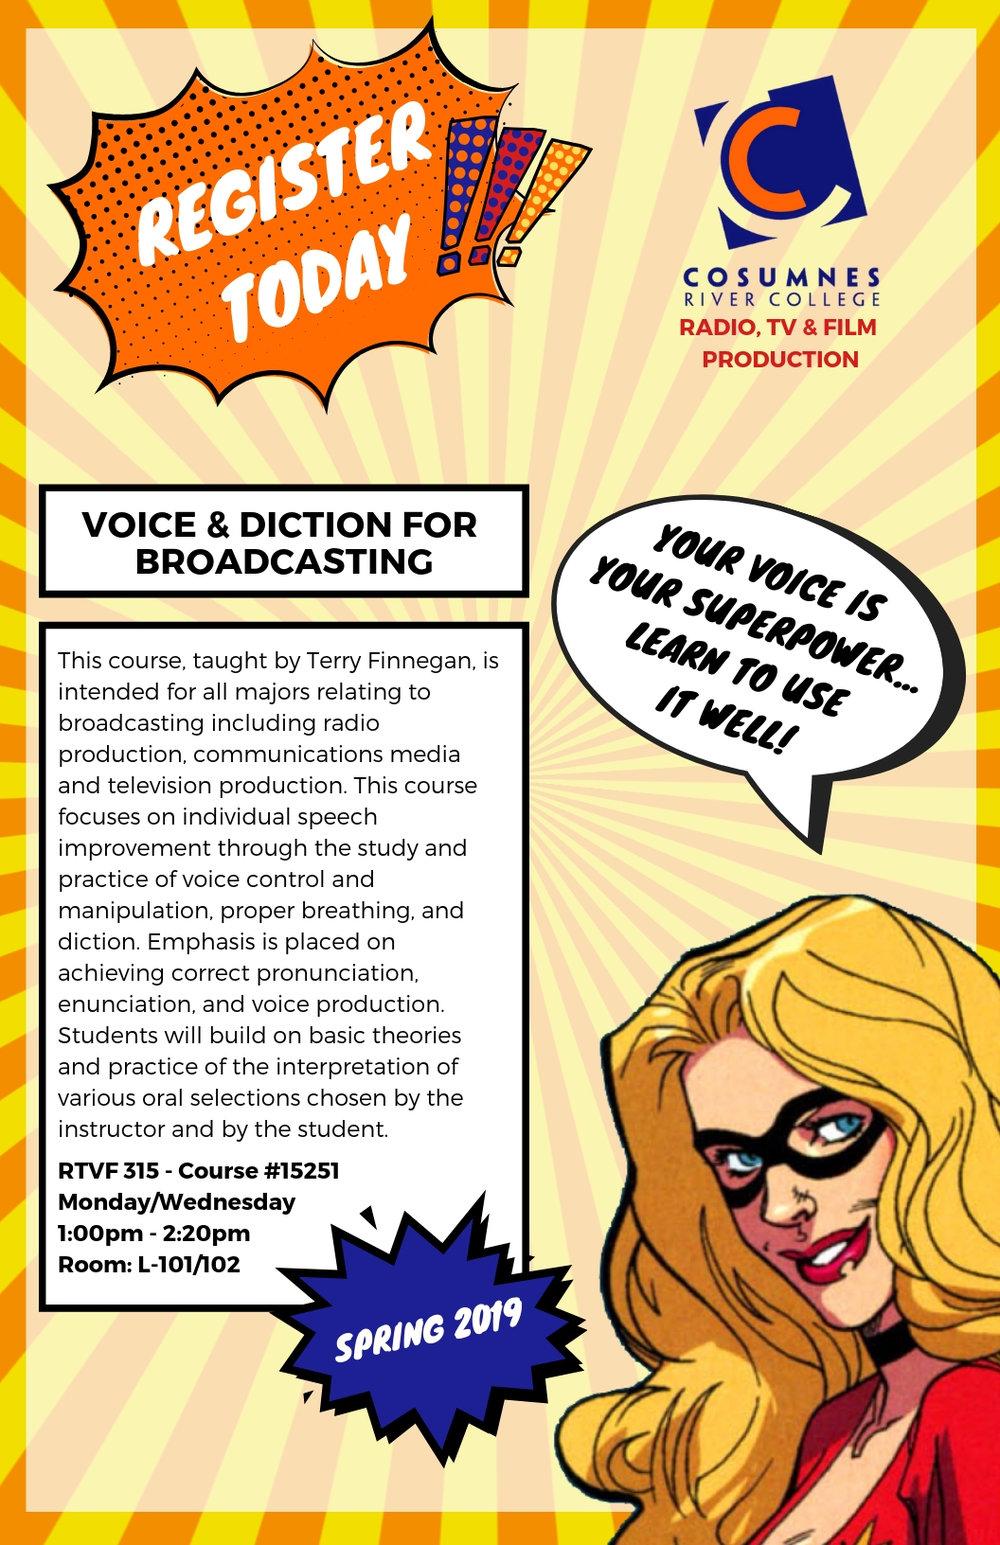 Voice & Diction Spring 2019.jpg